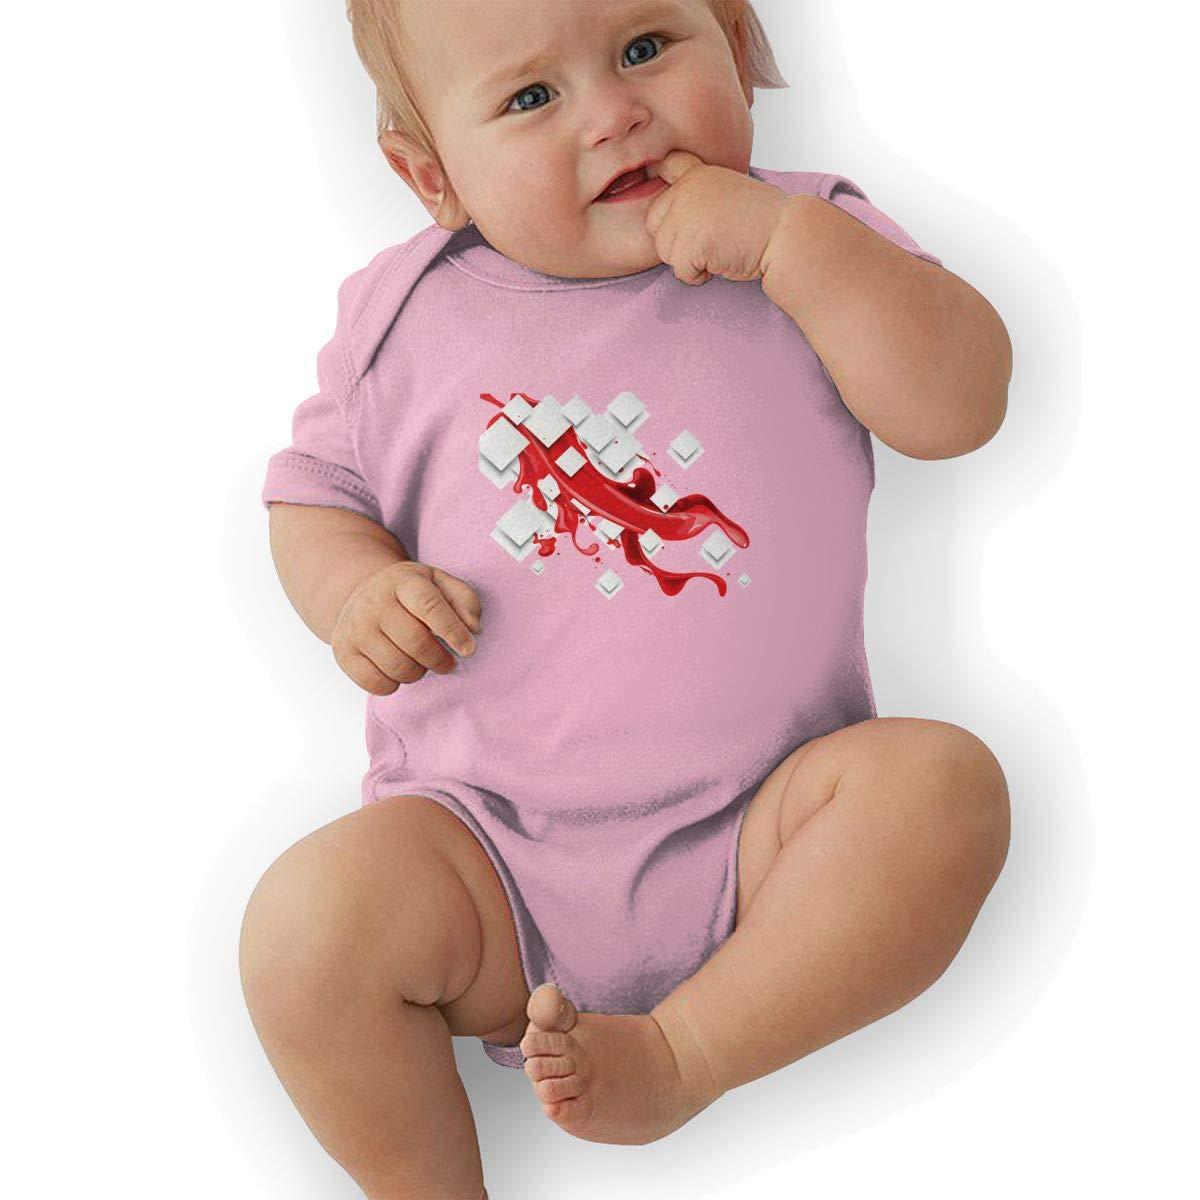 Newborn Baby Boys Bodysuit Short-Sleeve Onesie Creative Fashion Text Print Outfit Winter Pajamas